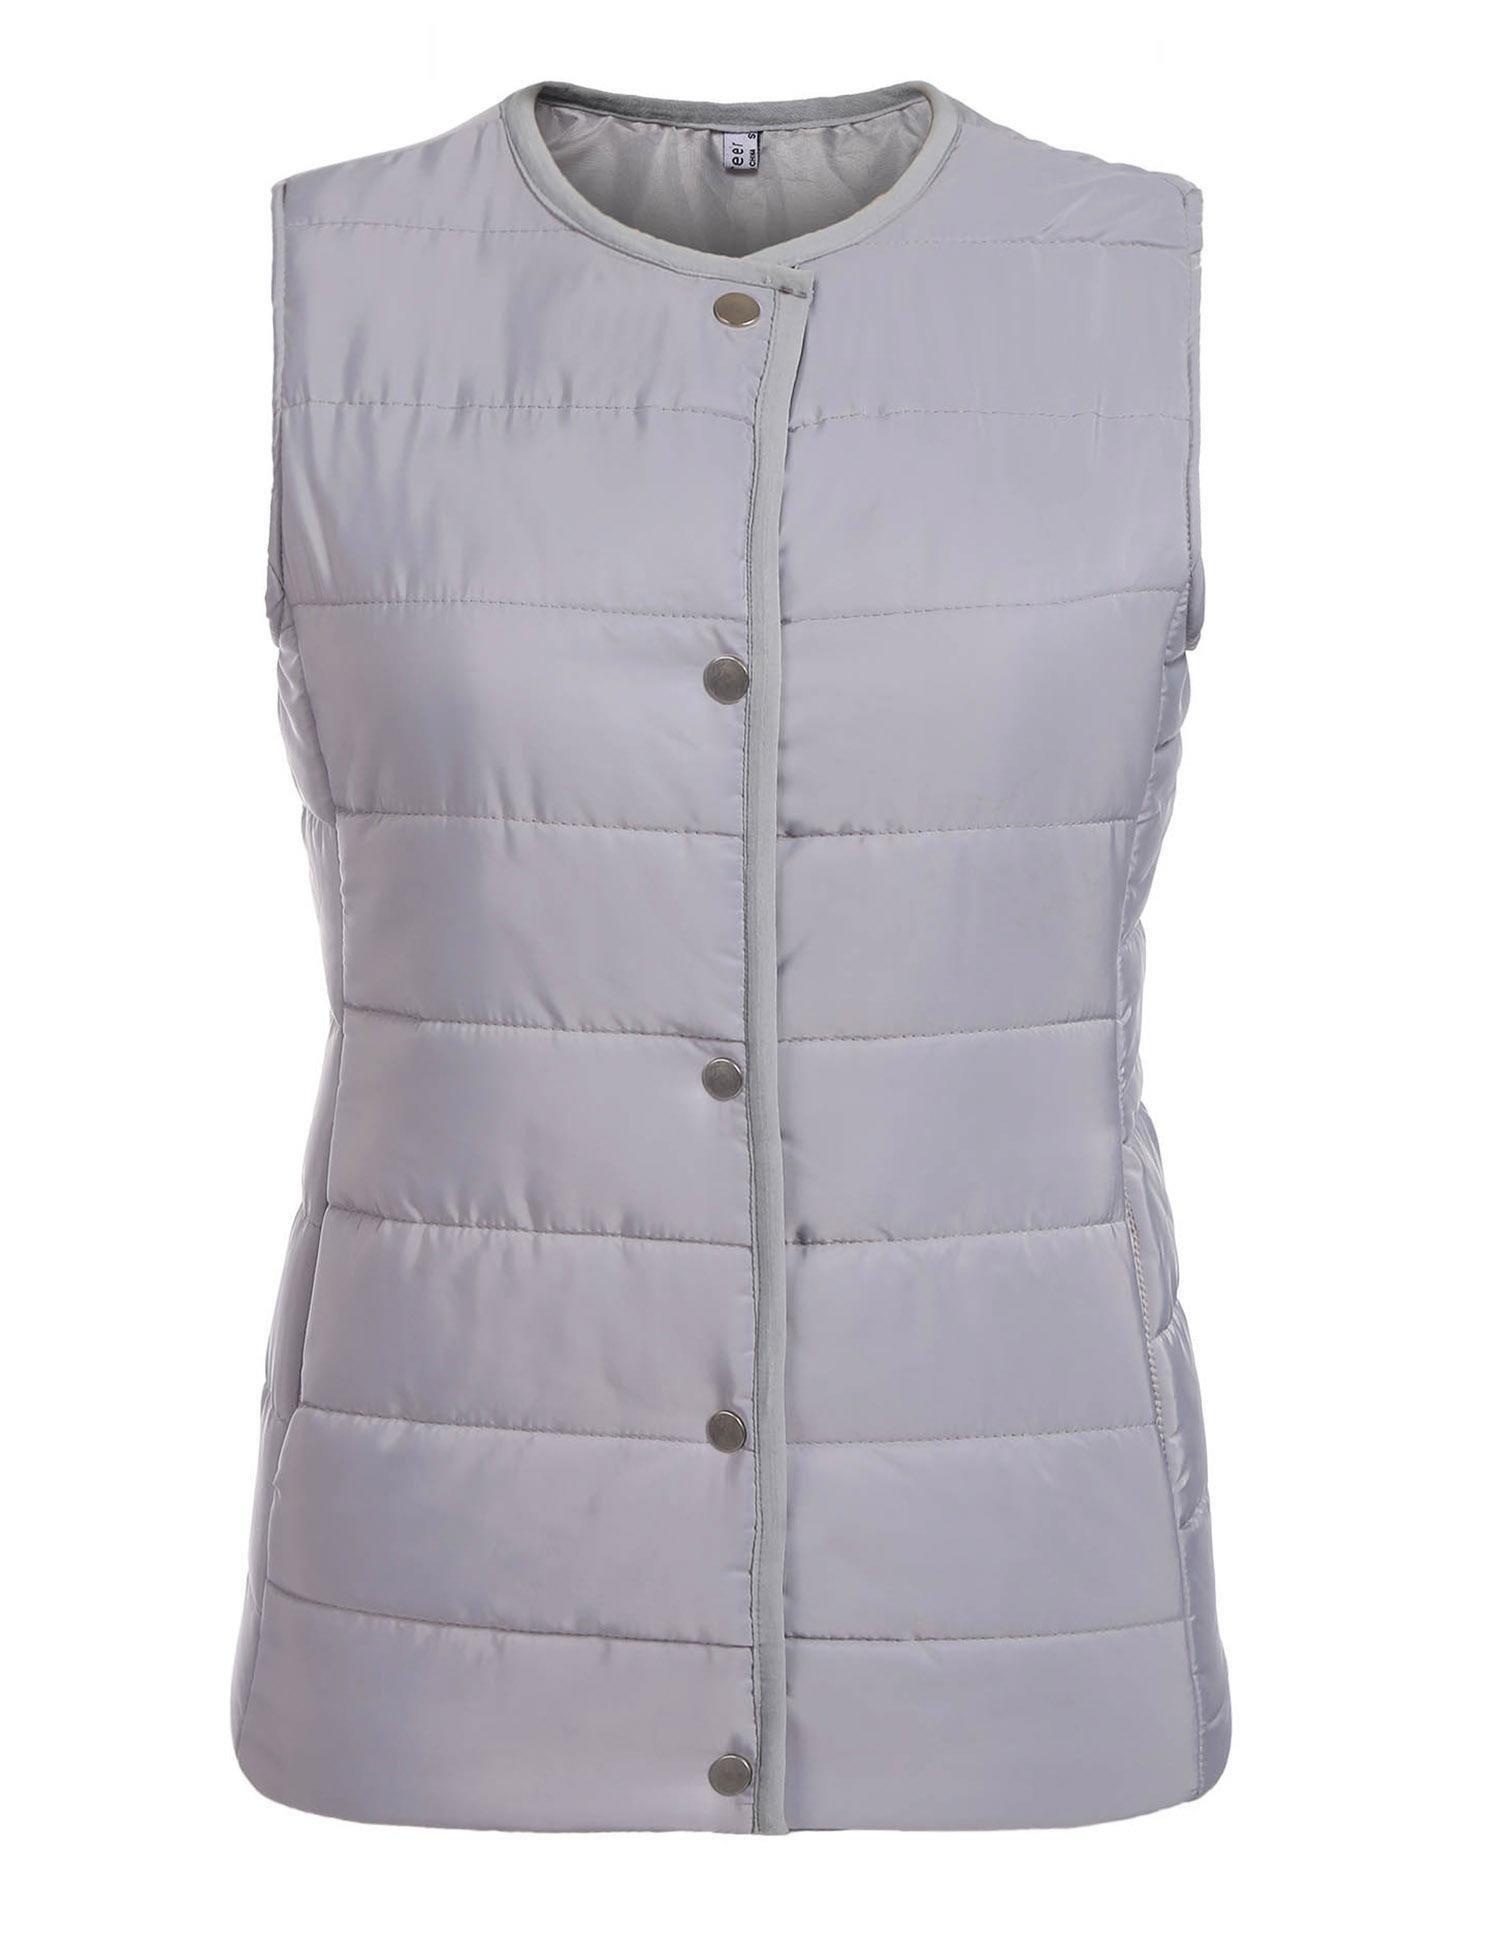 etuoji Women's Puffer Compact Vest O-Neck Solid Lightweight Winter Warm Button Down Quilted Vest Gilet